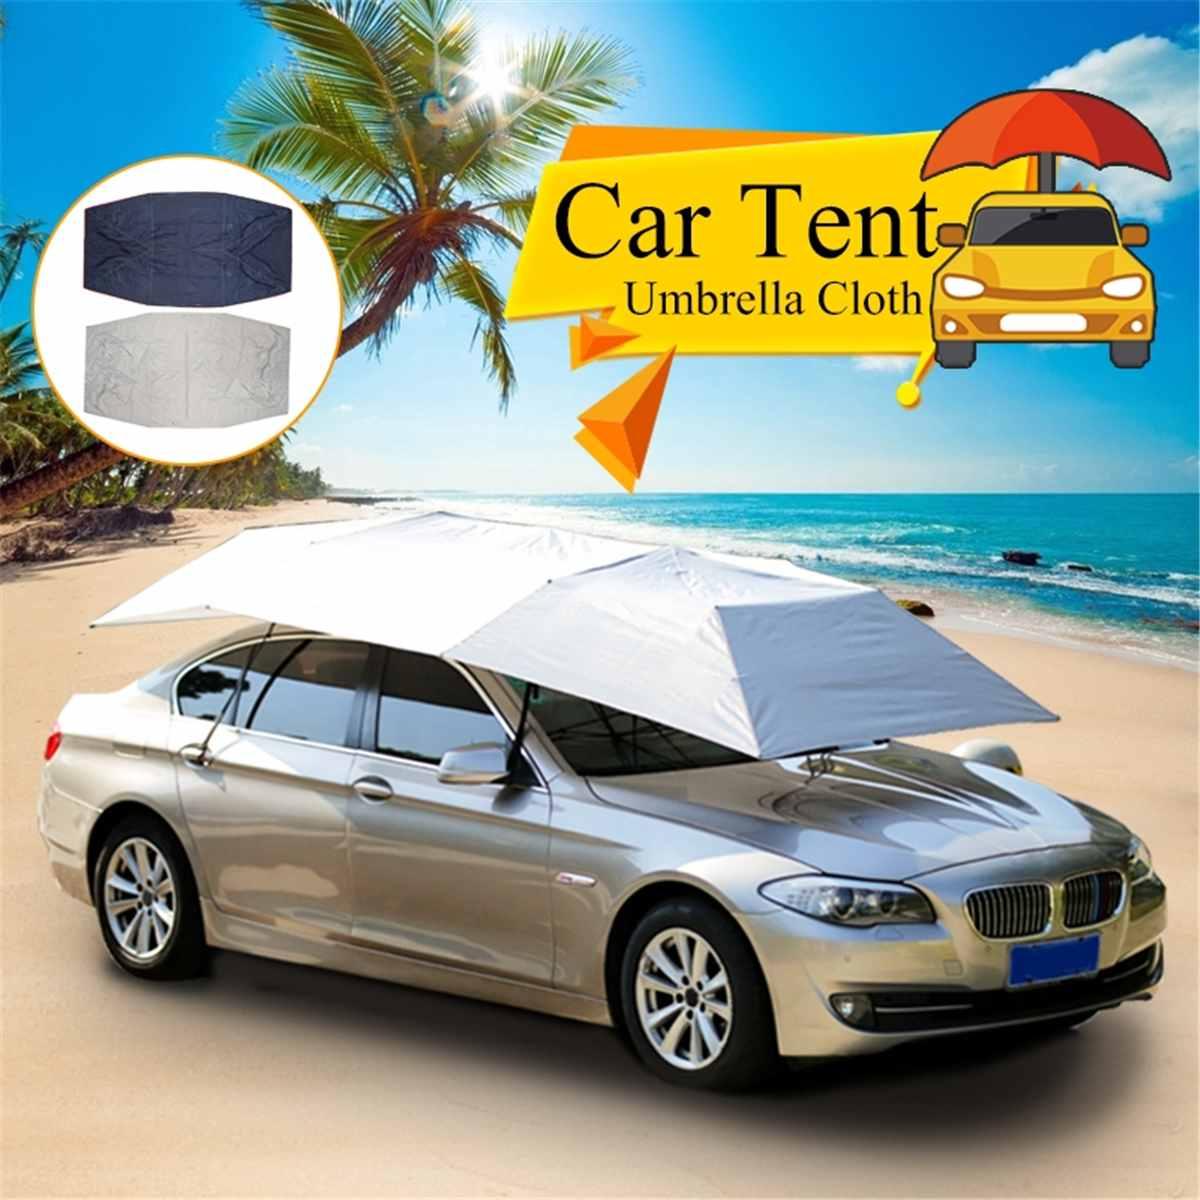 Full Automatic Car Umbrella Sun Shade Waterproof Outdoor Car Vehicle Tent Umbrella Sunshade Roof Cover Anti UV Cloth No Stand